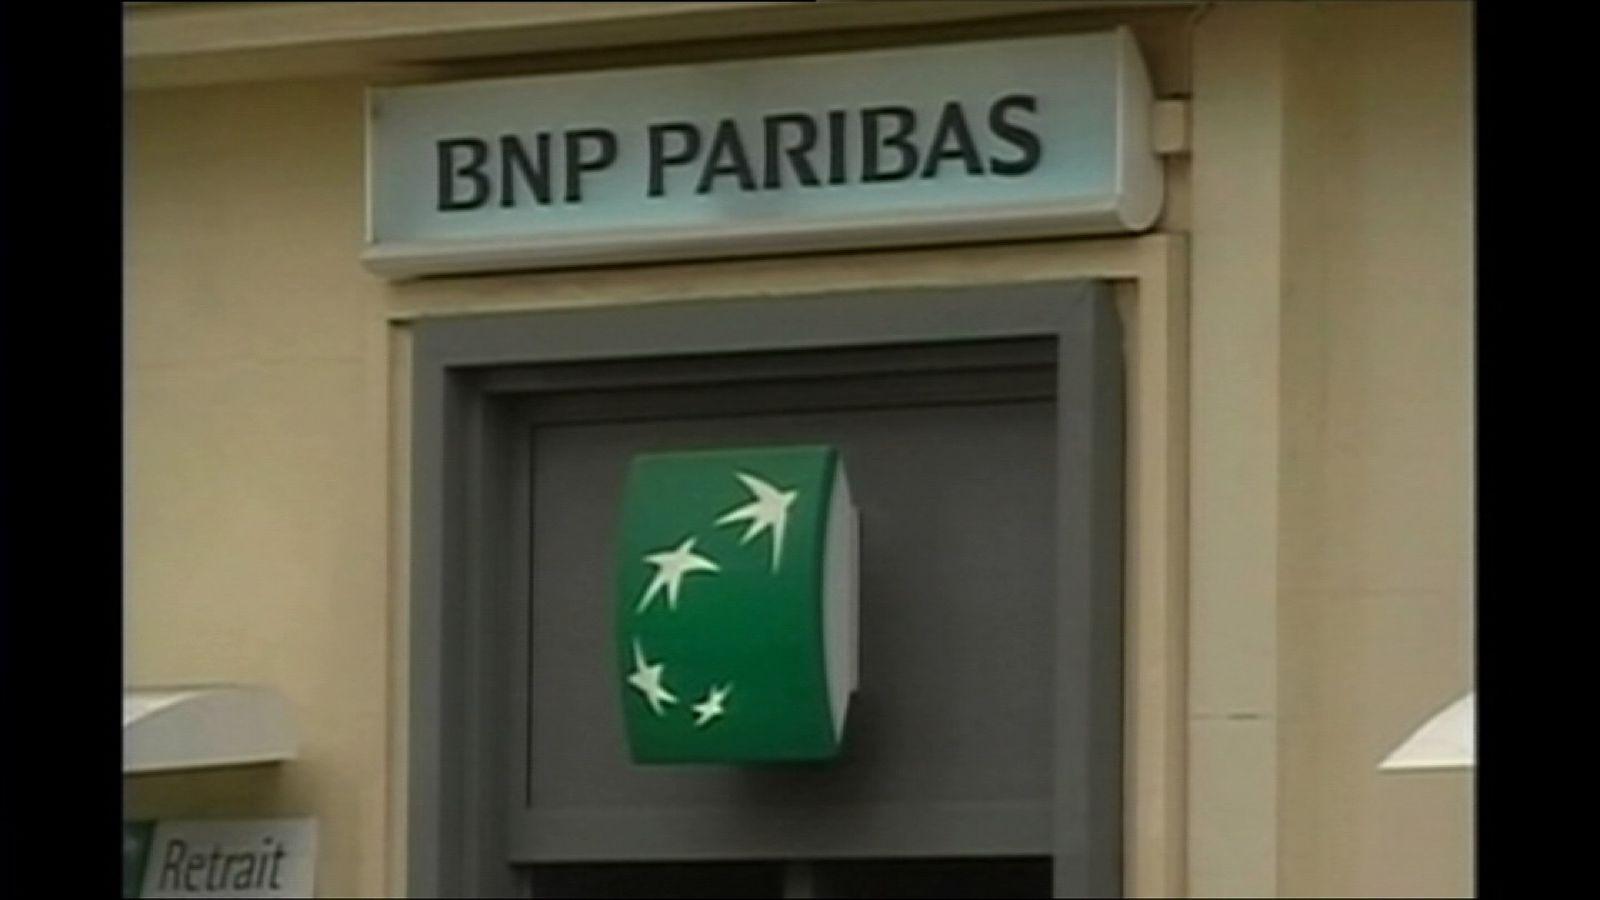 A BNP Paribas branch